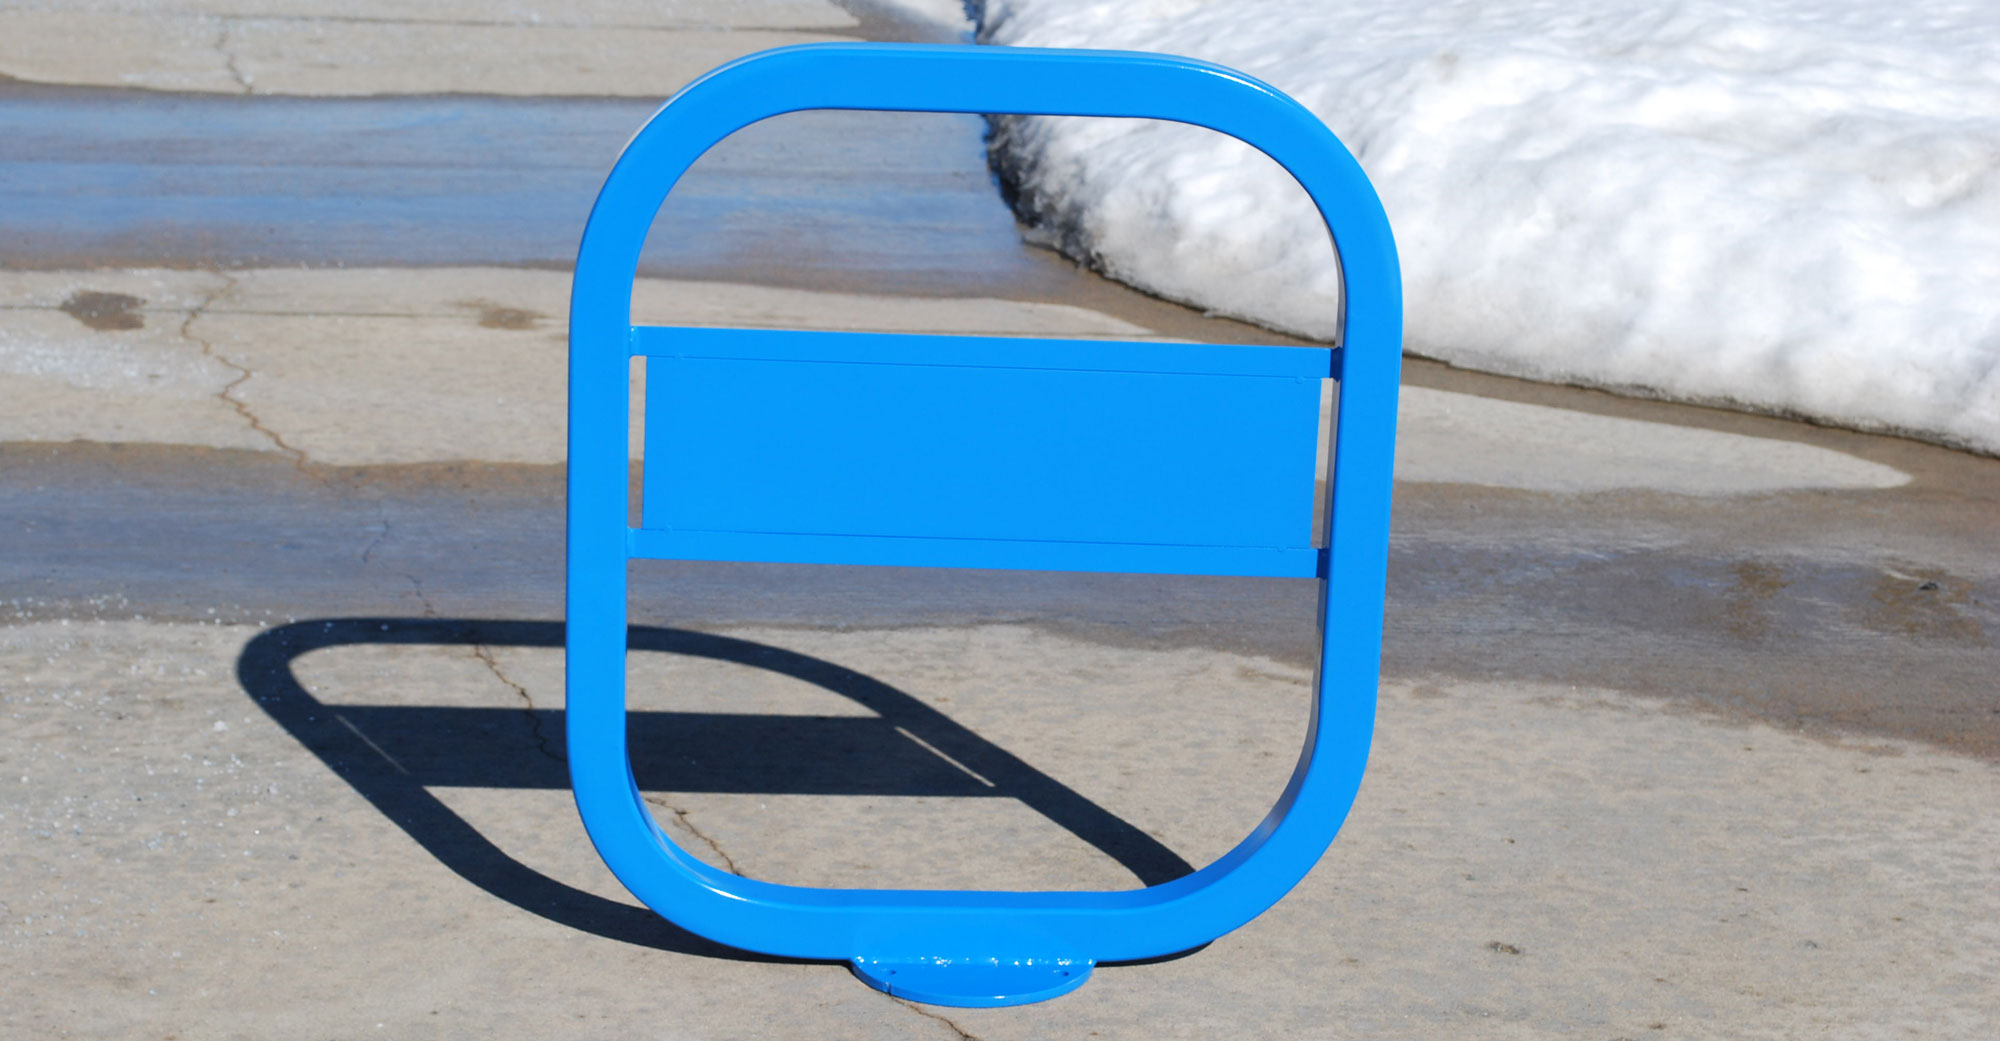 Custom-Bike-Rack-Social-Bike